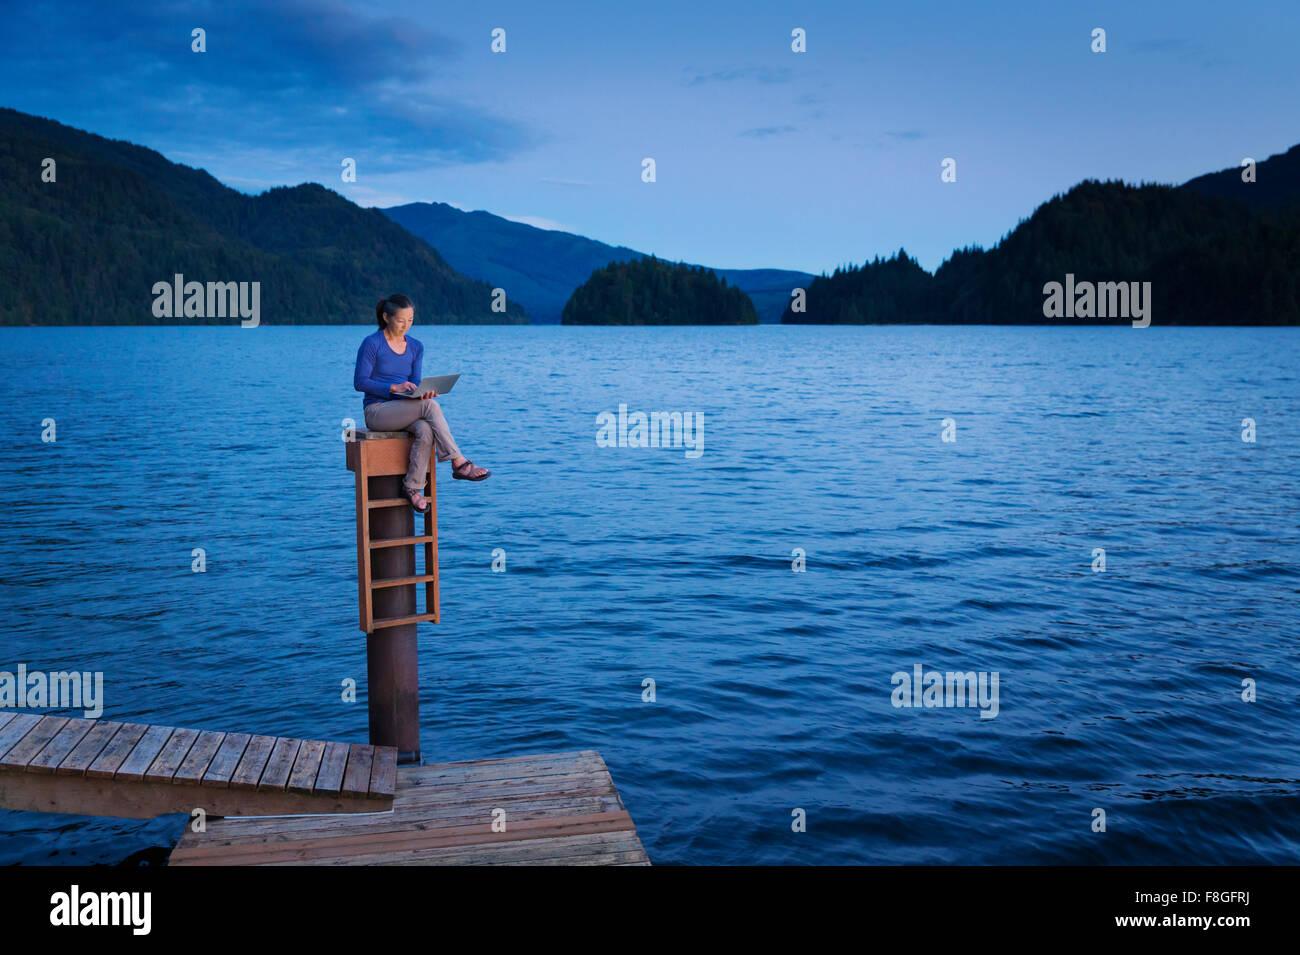 Japanese woman sitting on wooden dock at lake Stock Photo